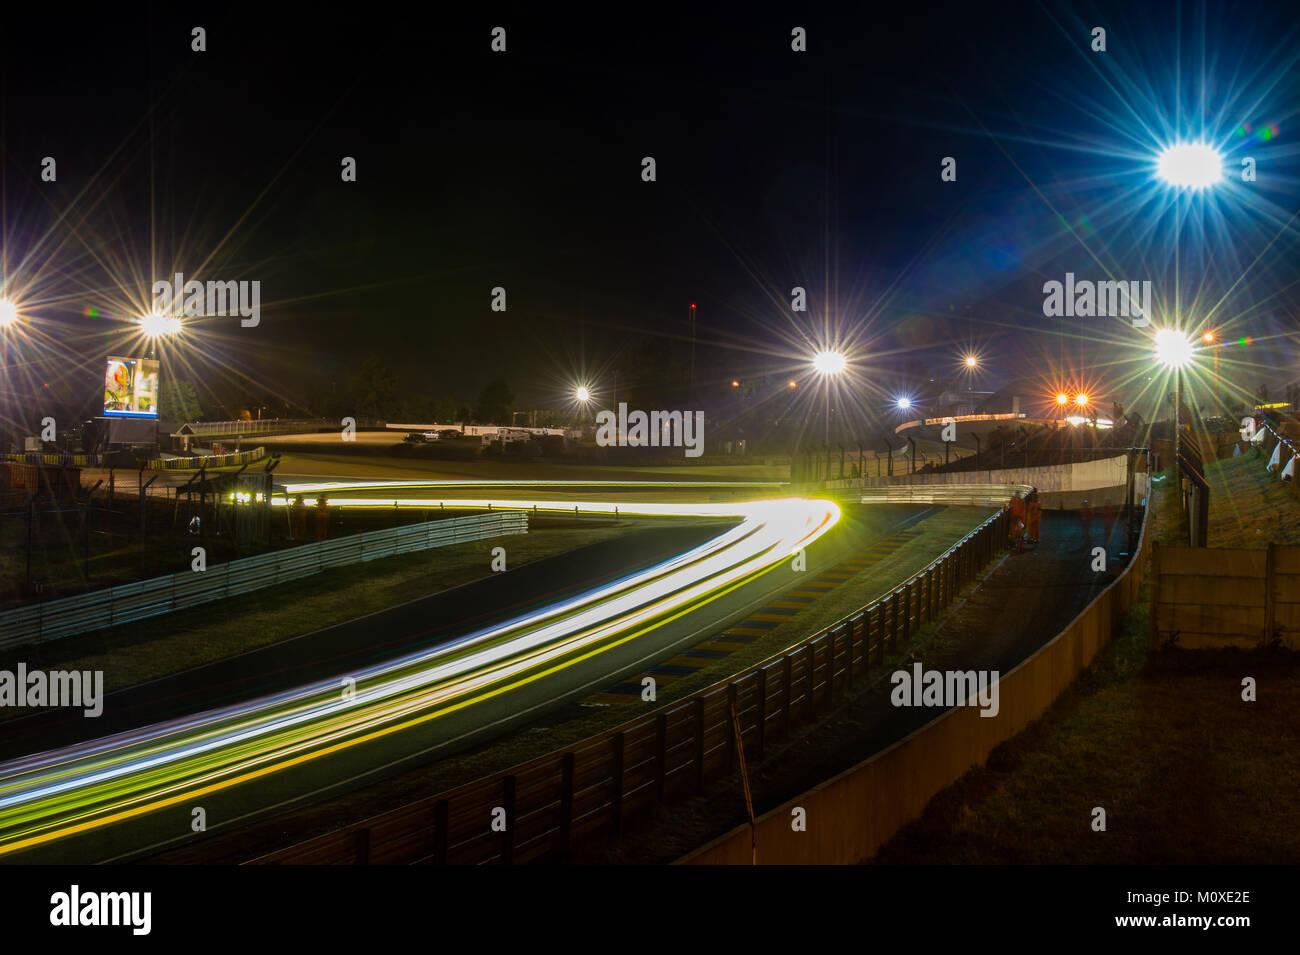 Light trails through the Esses into Tertre Rouge during the 2017 24 Hours Le Mans race at Circuit de la Sarthe on Stock Photo